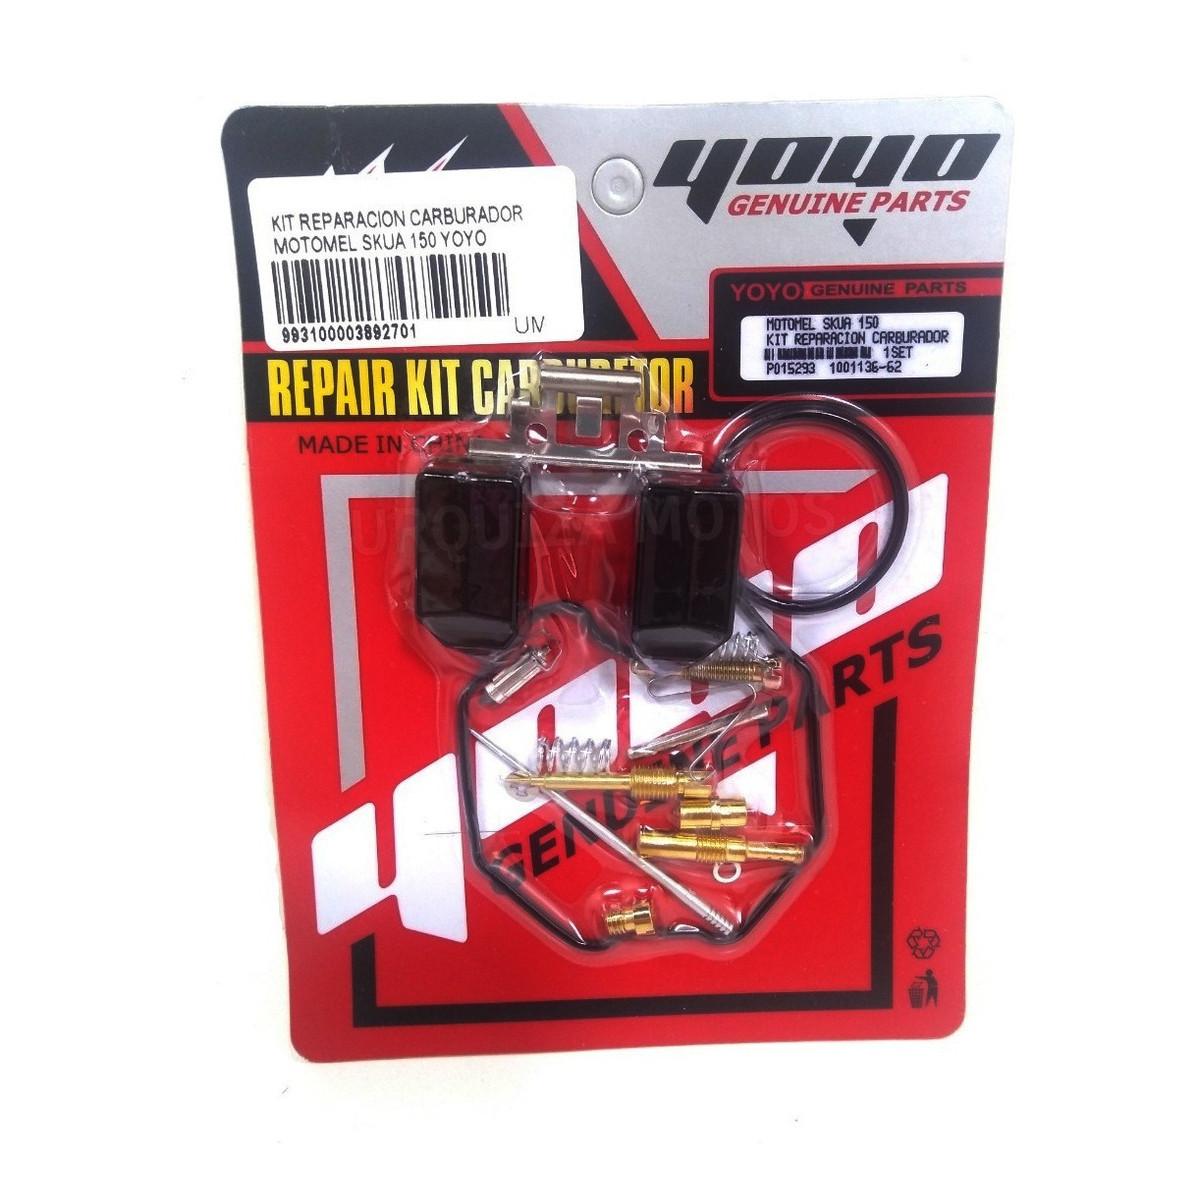 Kit Reparacion Carburador Motomel Skua 150 Yoyo